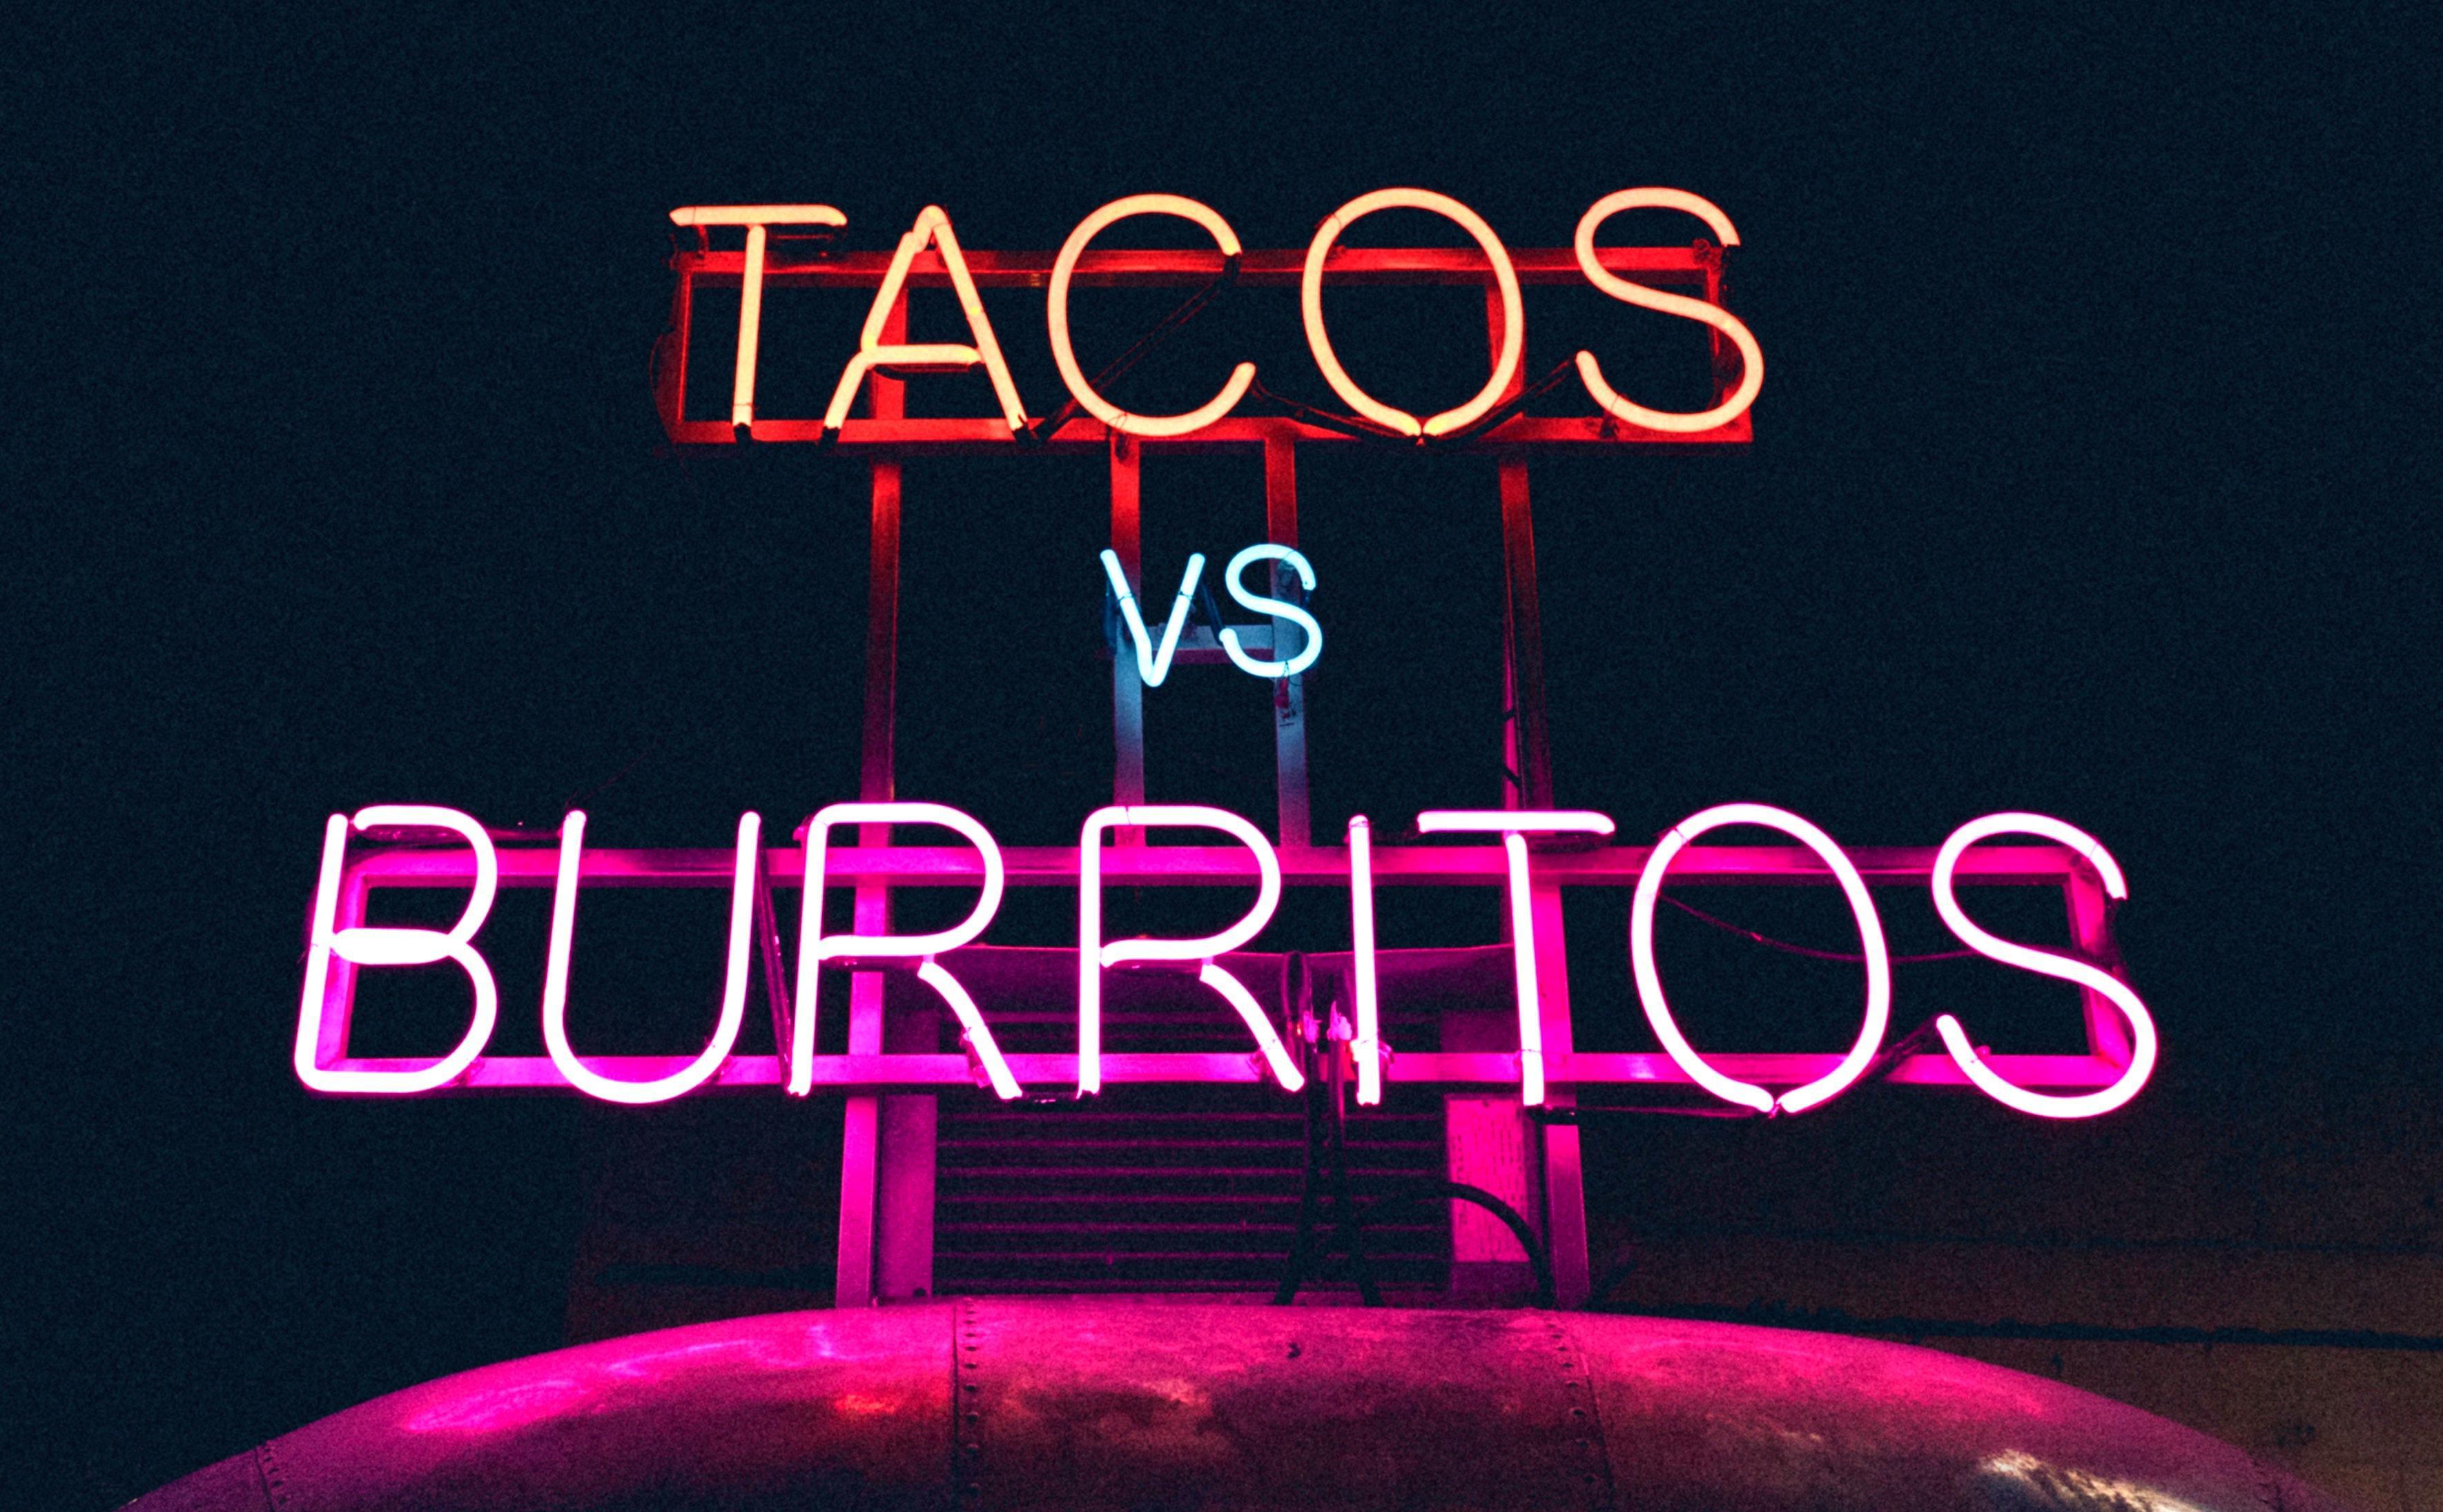 Tacos vs burrito sign